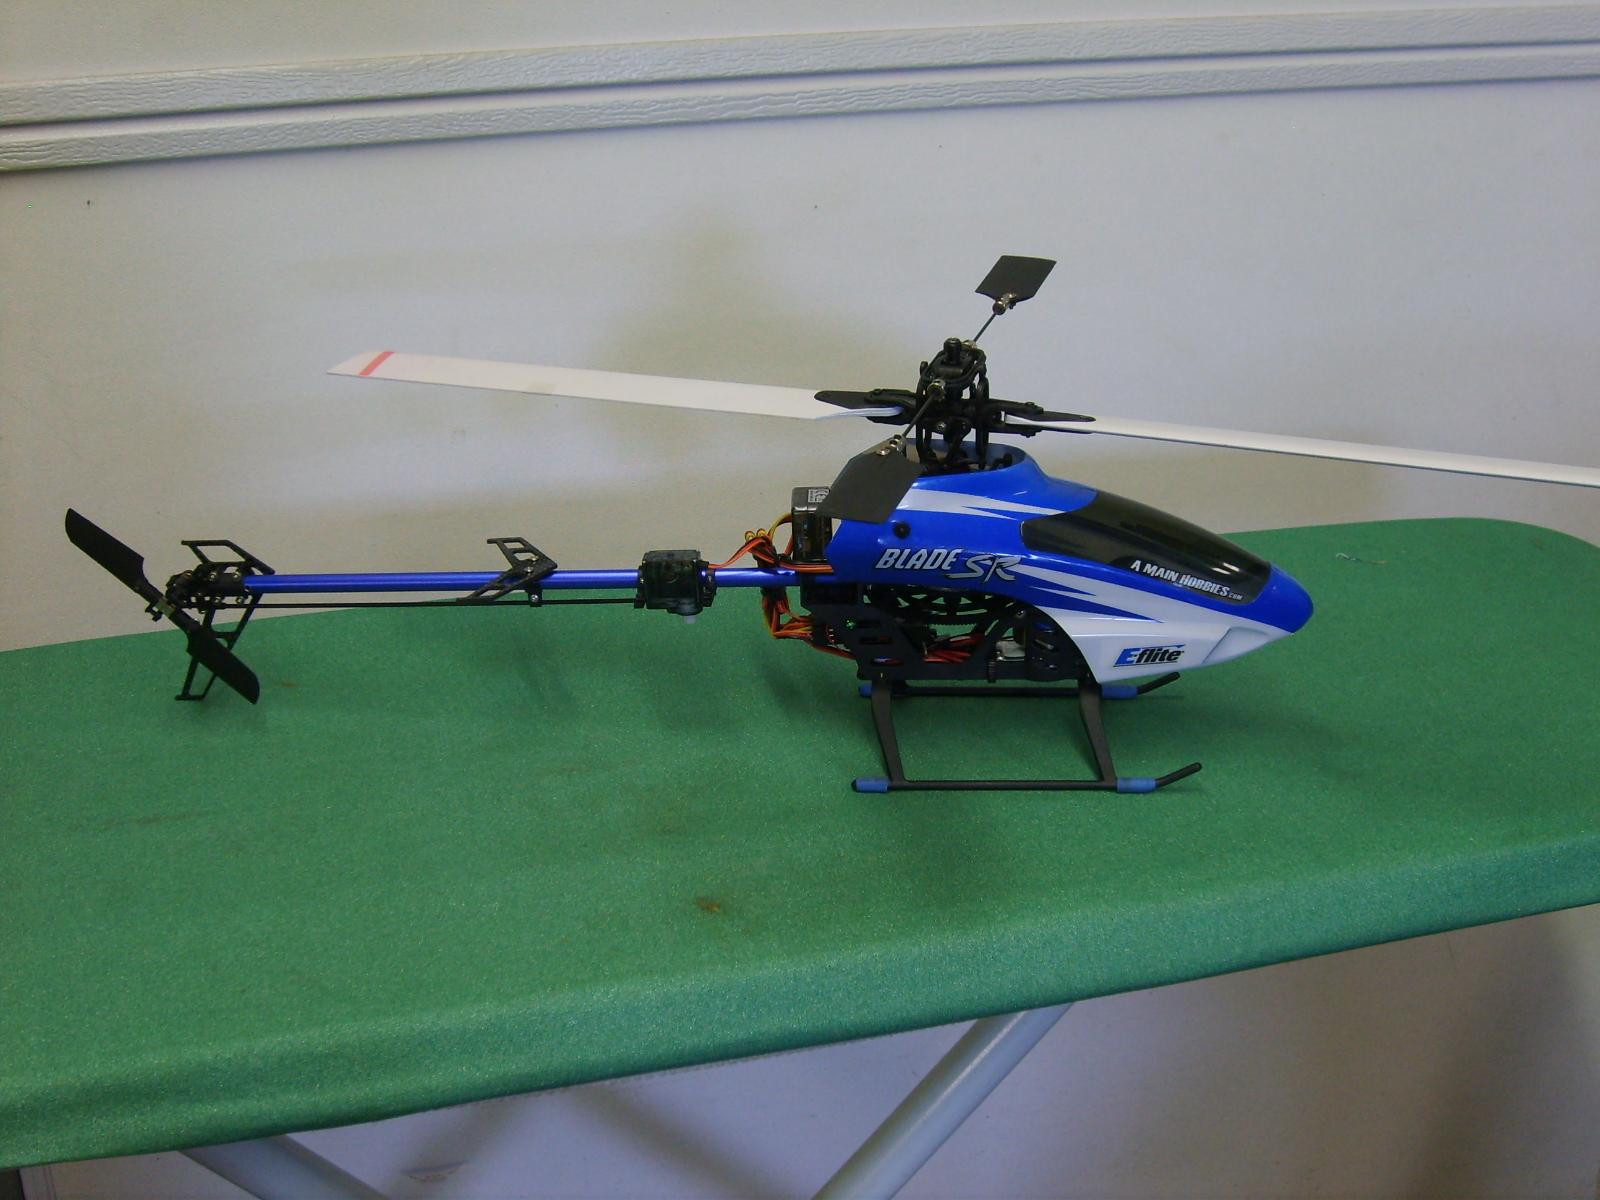 Blade SR w/Freestyle Hobby tail mod